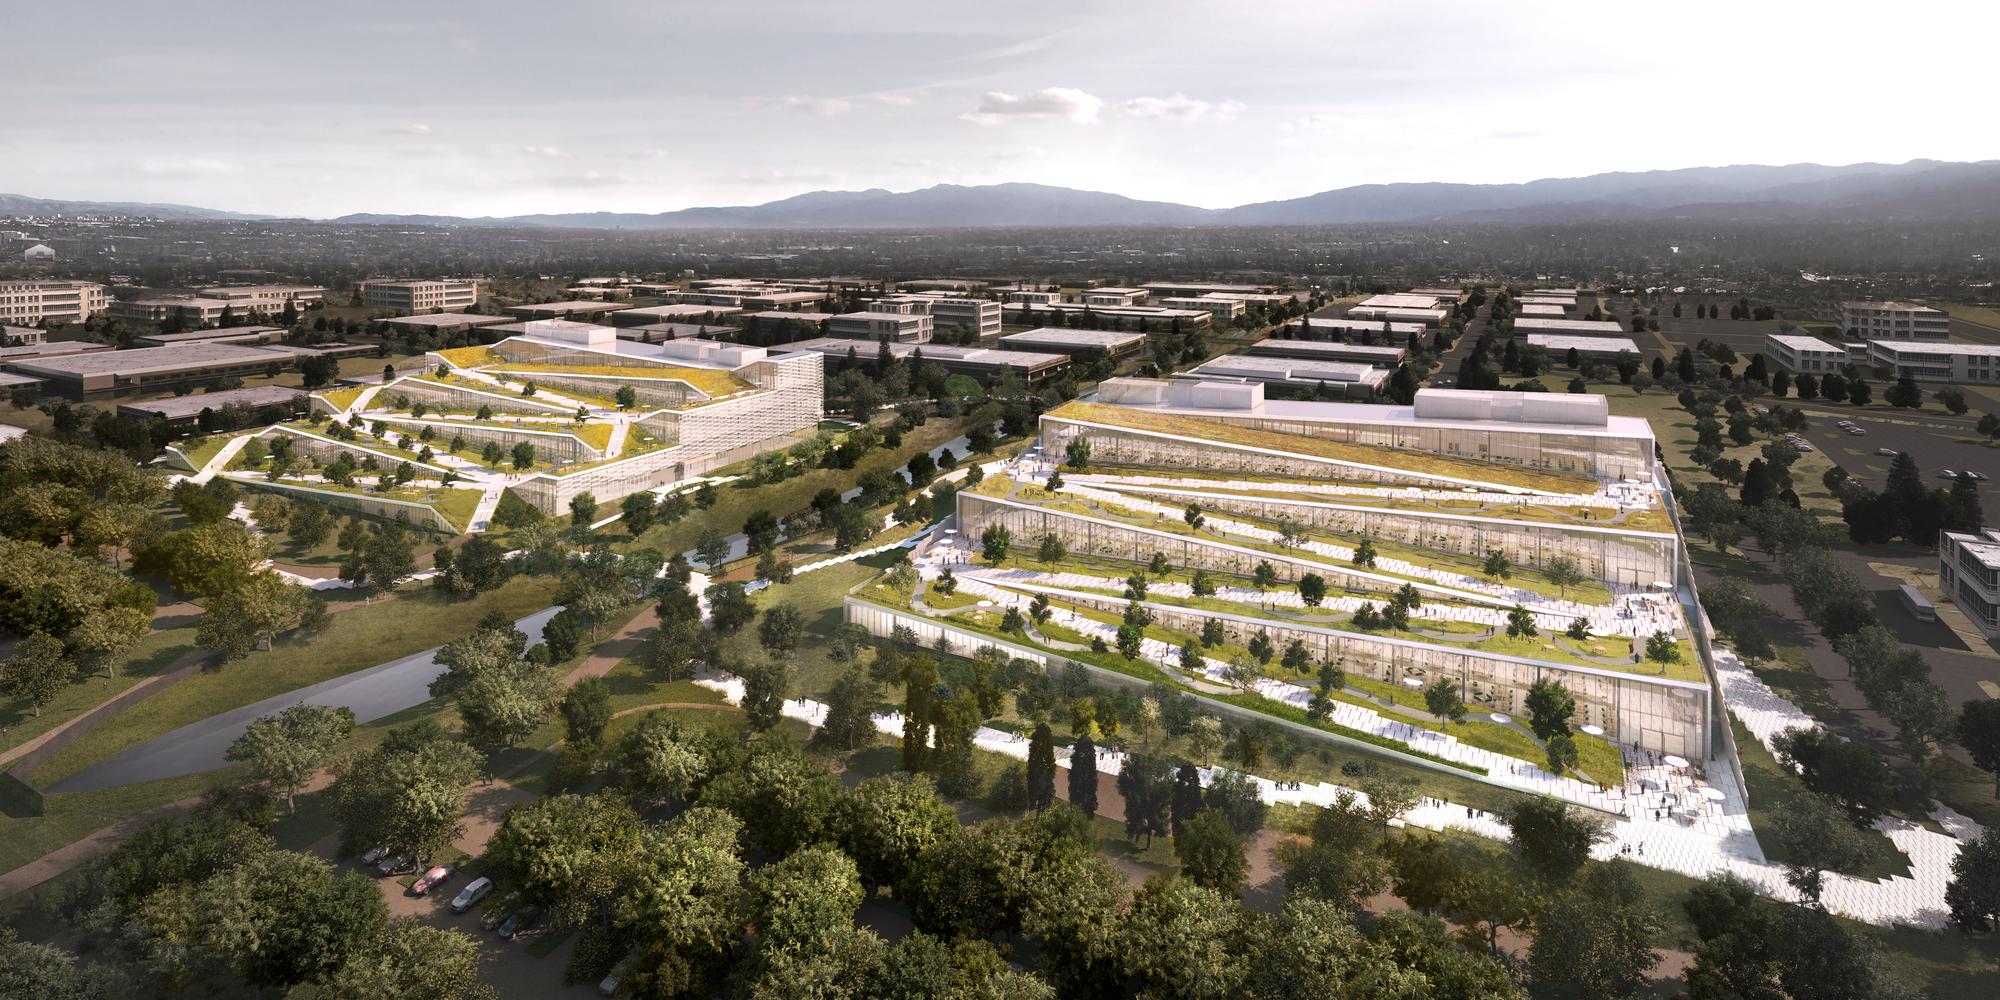 jordan 23 google office. Google Reveals Plans For 1 Million Square Foot BIG-Designed Campus In Sunnyvale, California Jordan 23 Office O